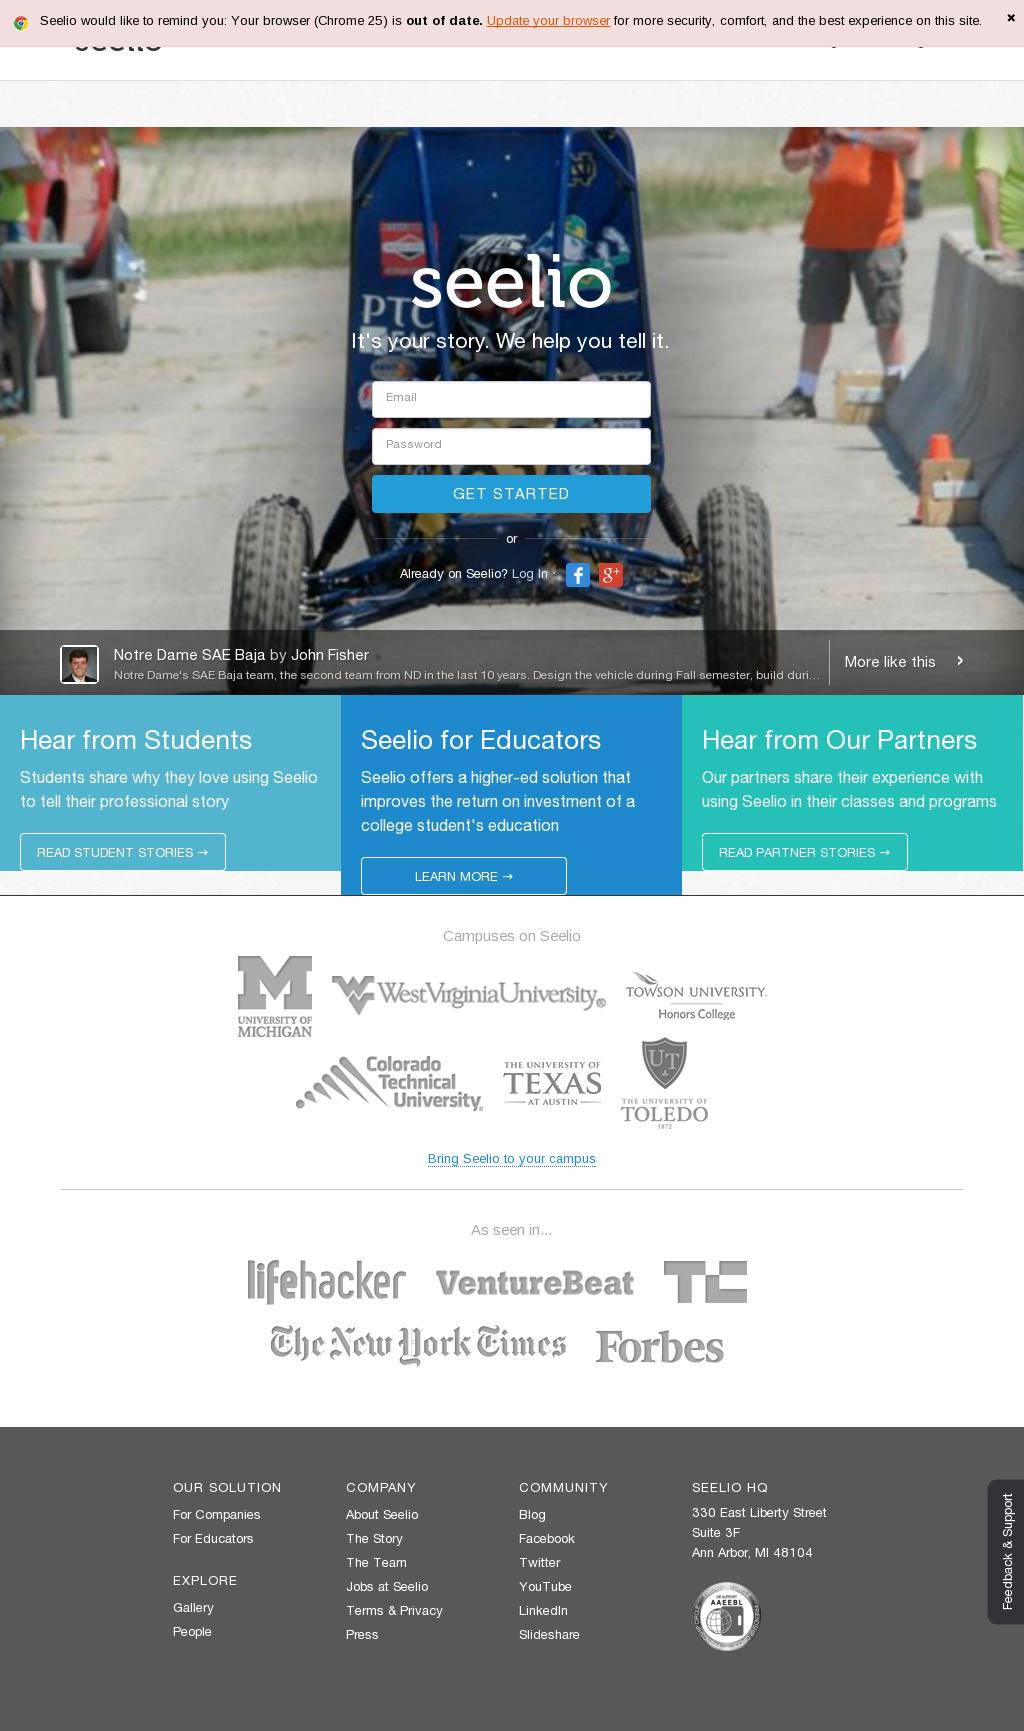 Seelio Competitors, Revenue and Employees - Owler Company Profile